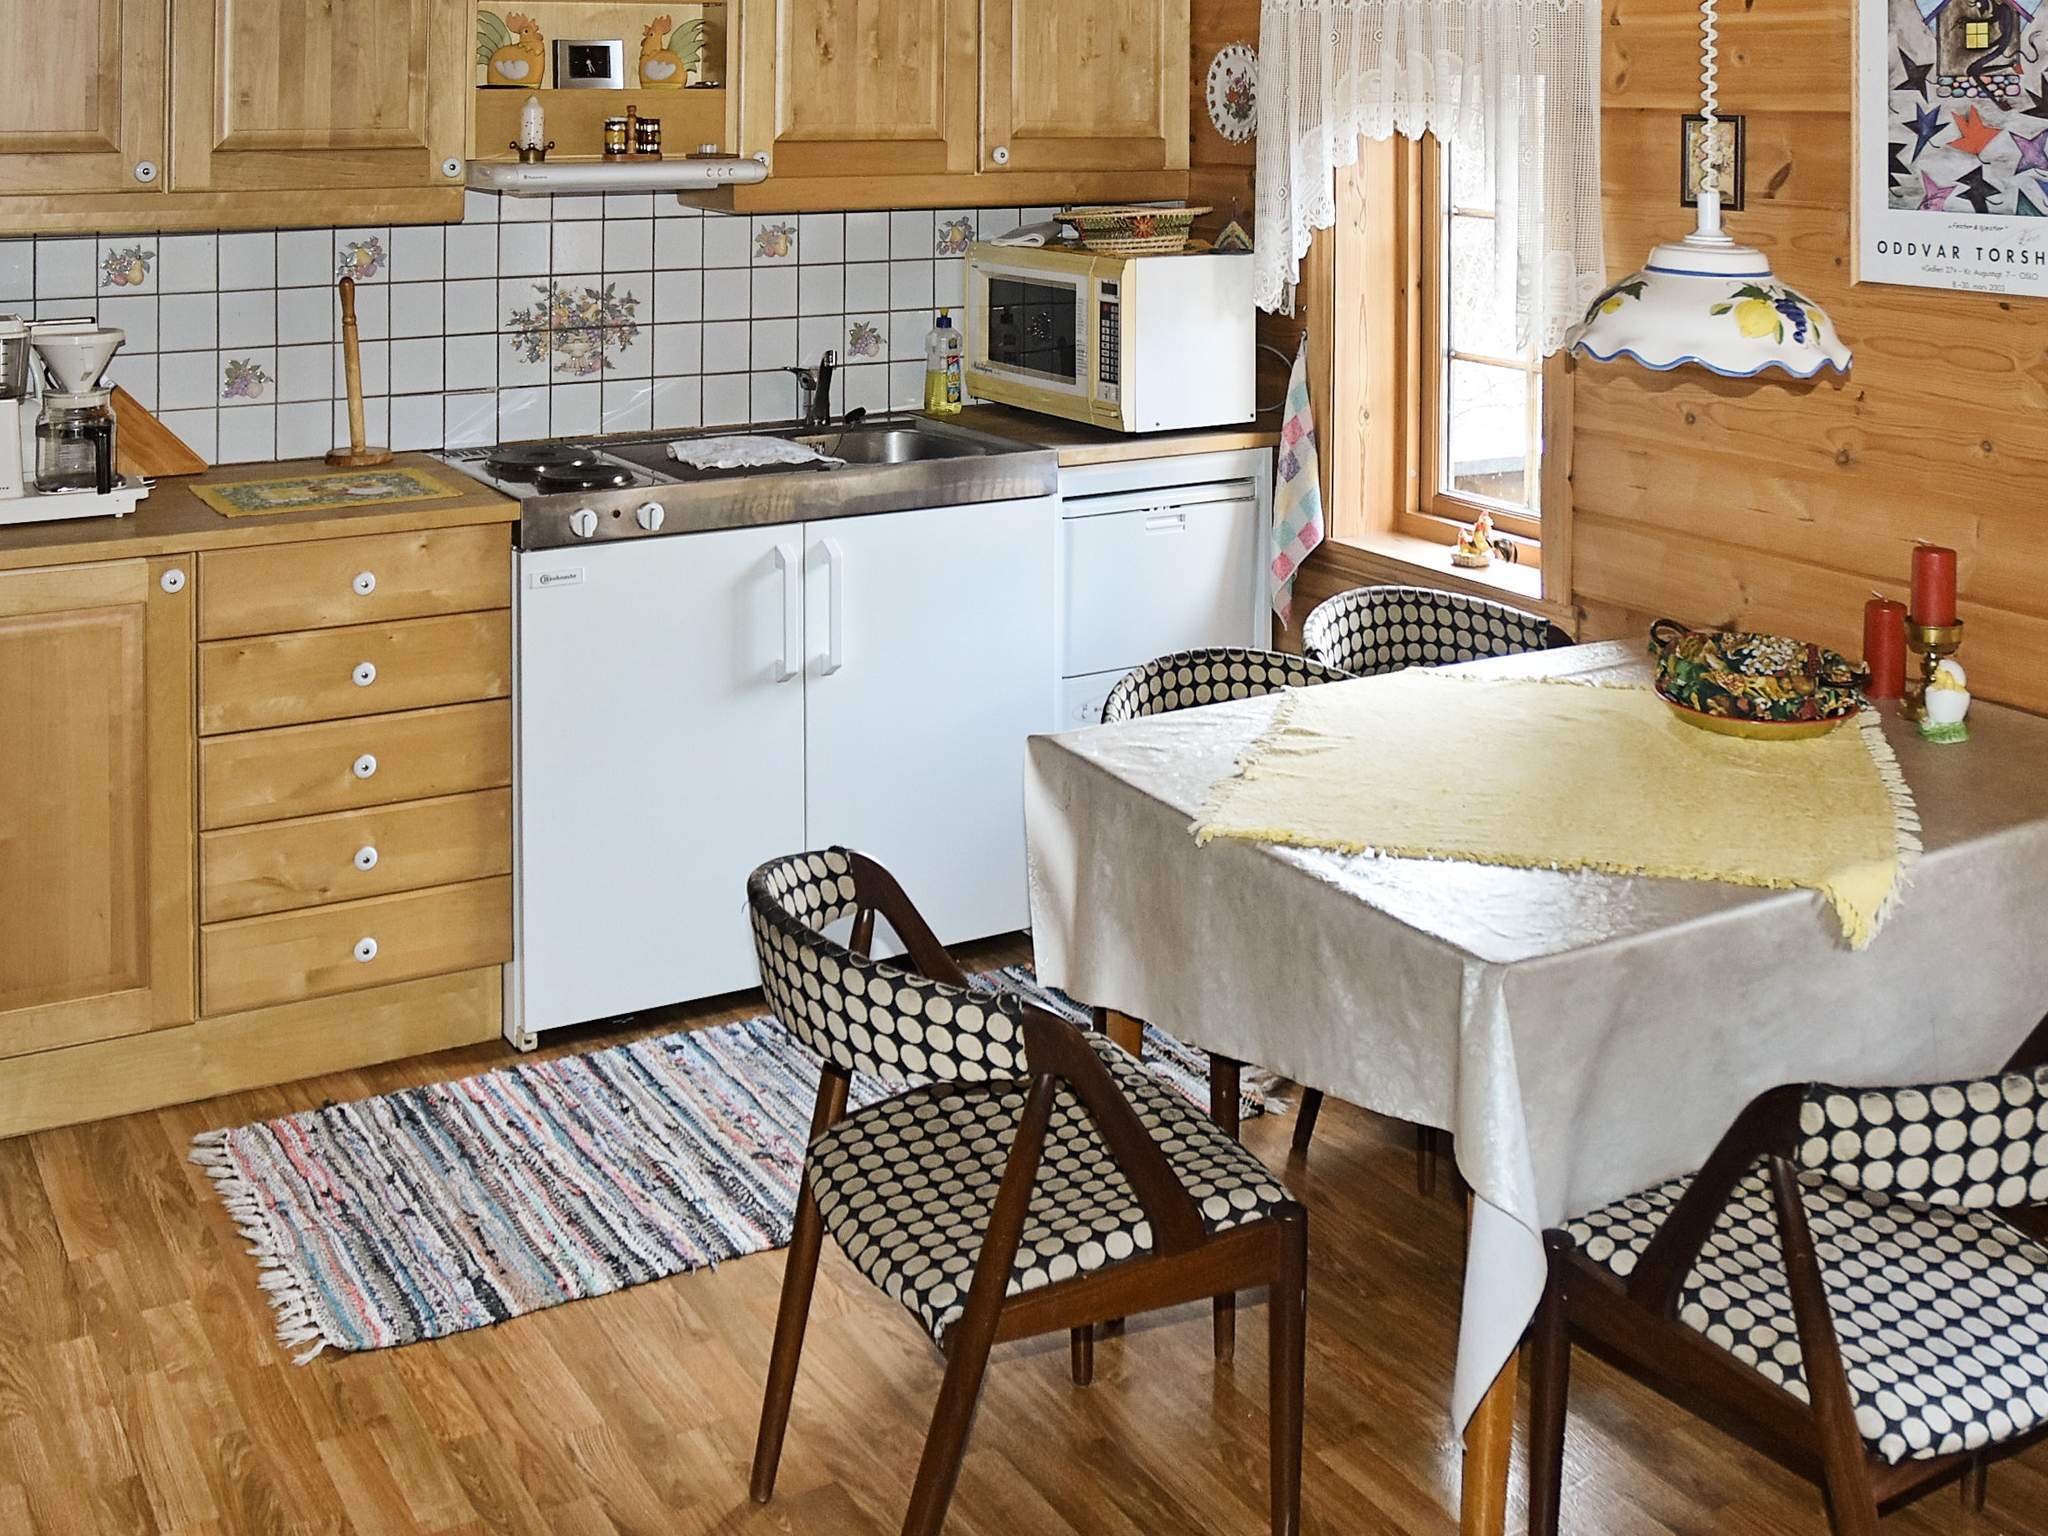 Ferienhaus Helle (82342), Naustdal, Sognefjord - Nordfjord, Westnorwegen, Norwegen, Bild 4